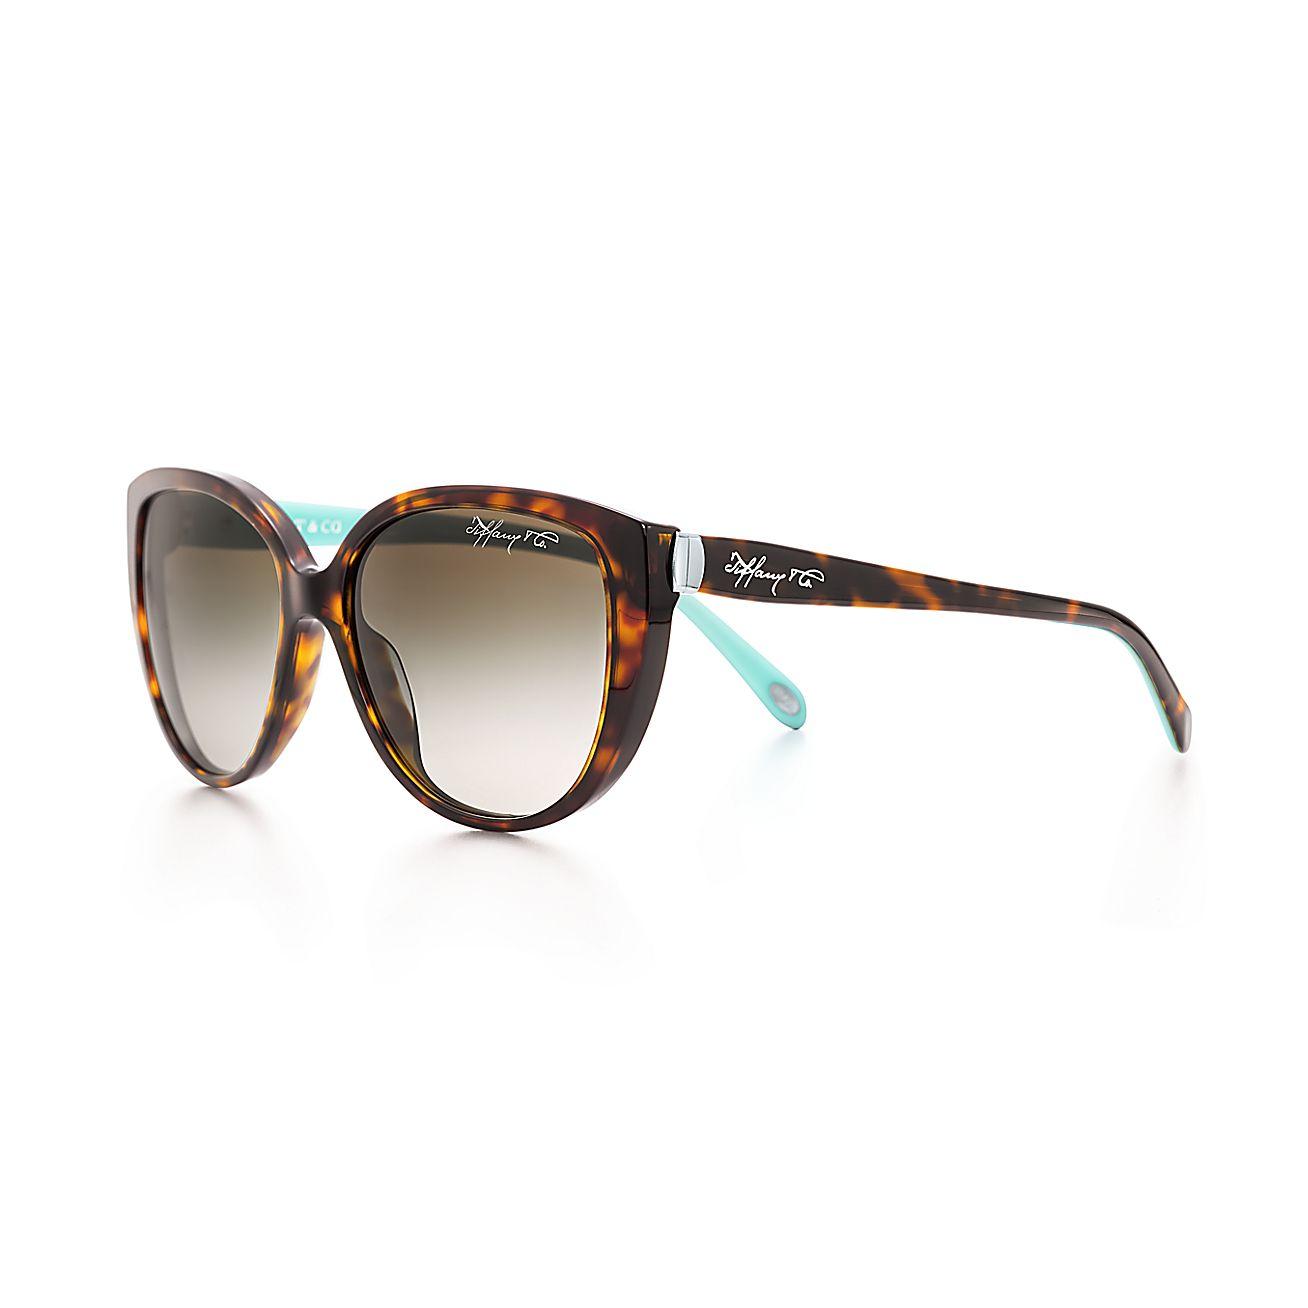 beb010864c94 Who Makes Tiffany Sunglasses